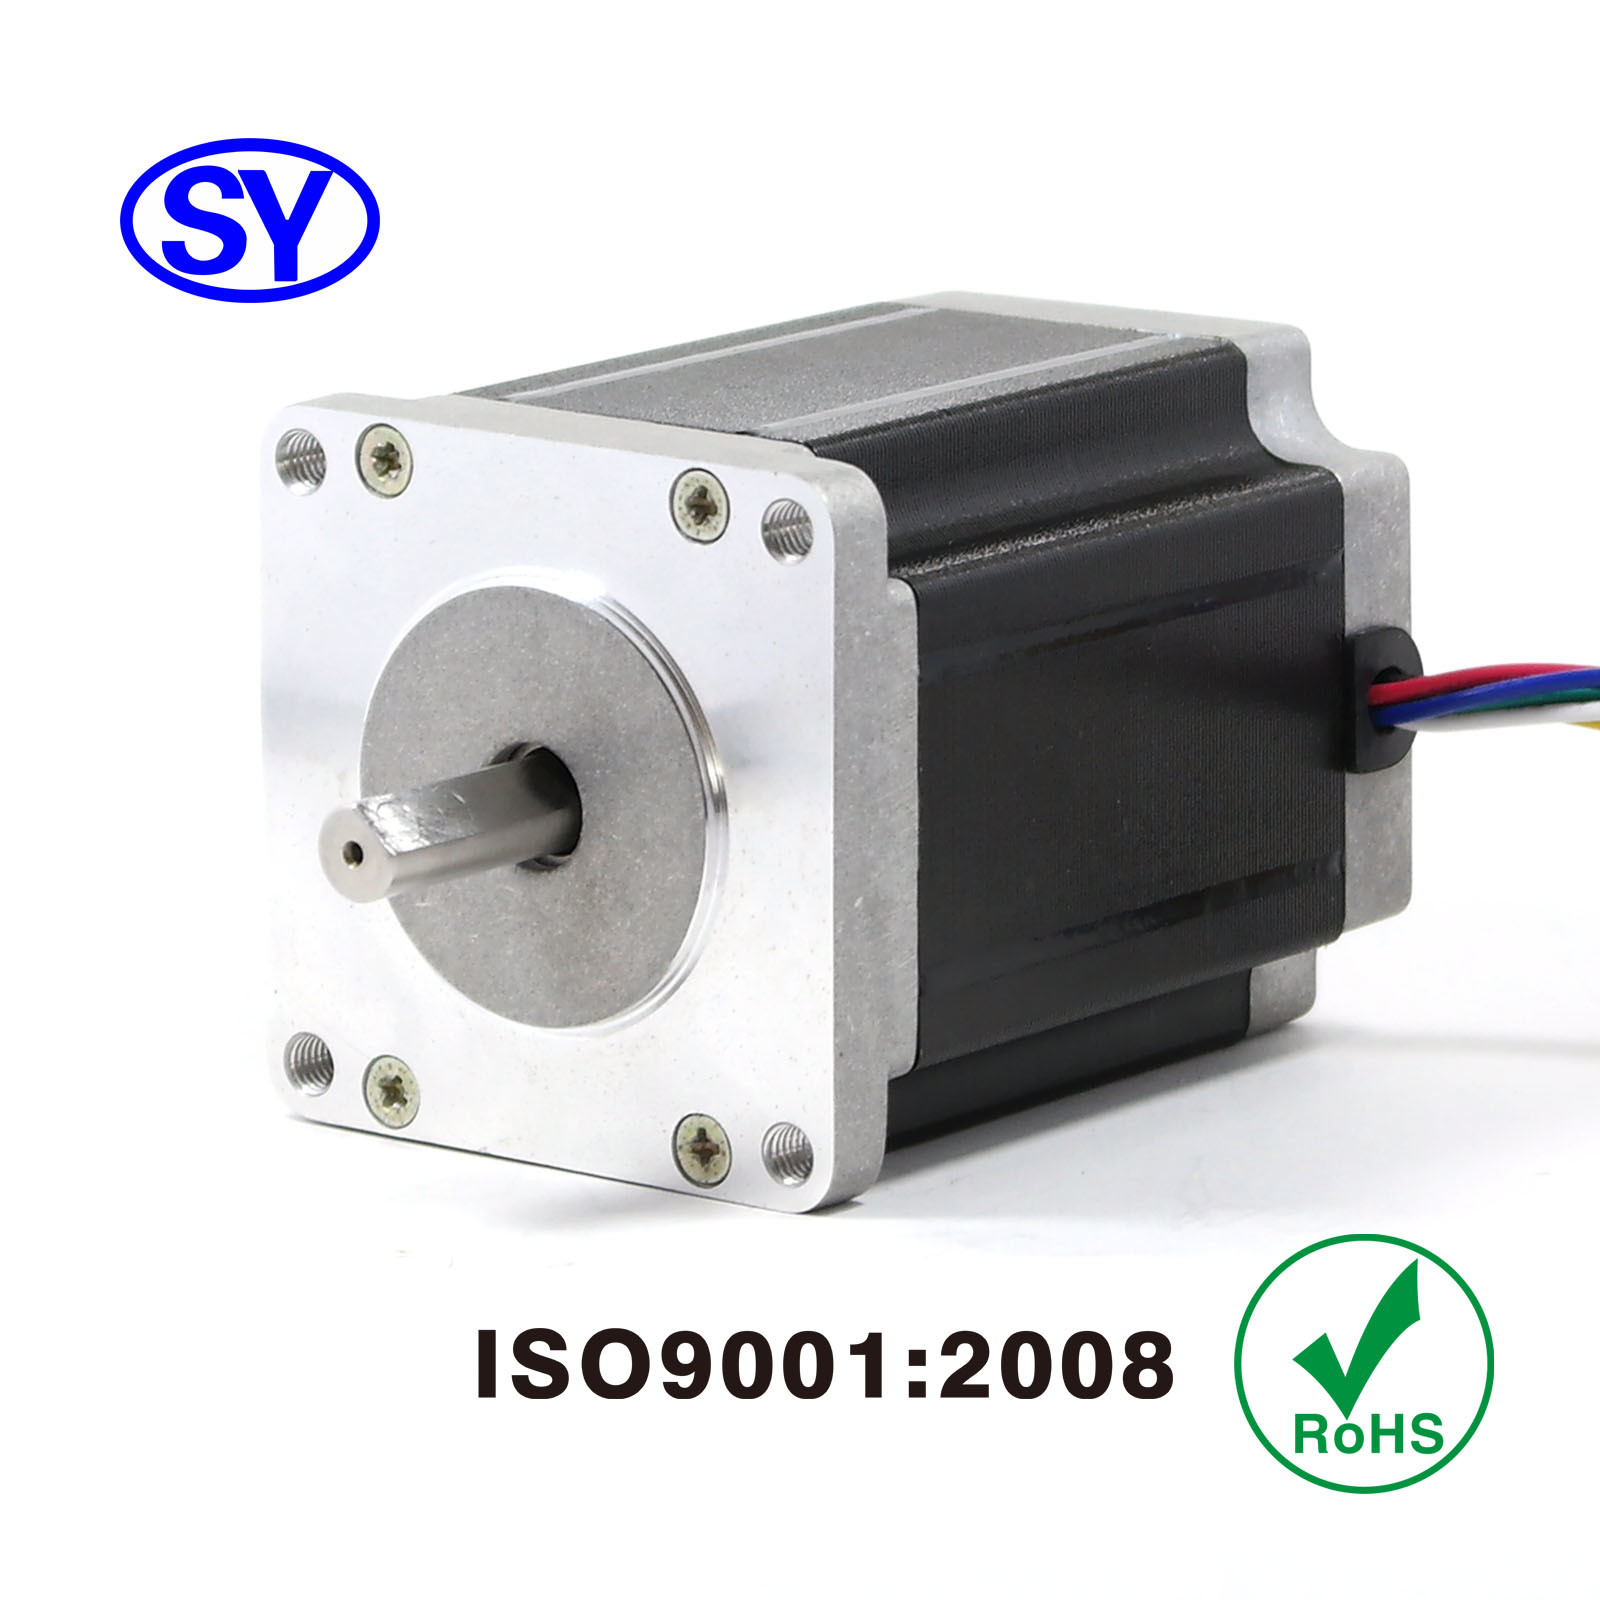 NEMA 24 60*60 mm Electrical Stepper Motor for 3D Printer, CNC Machine